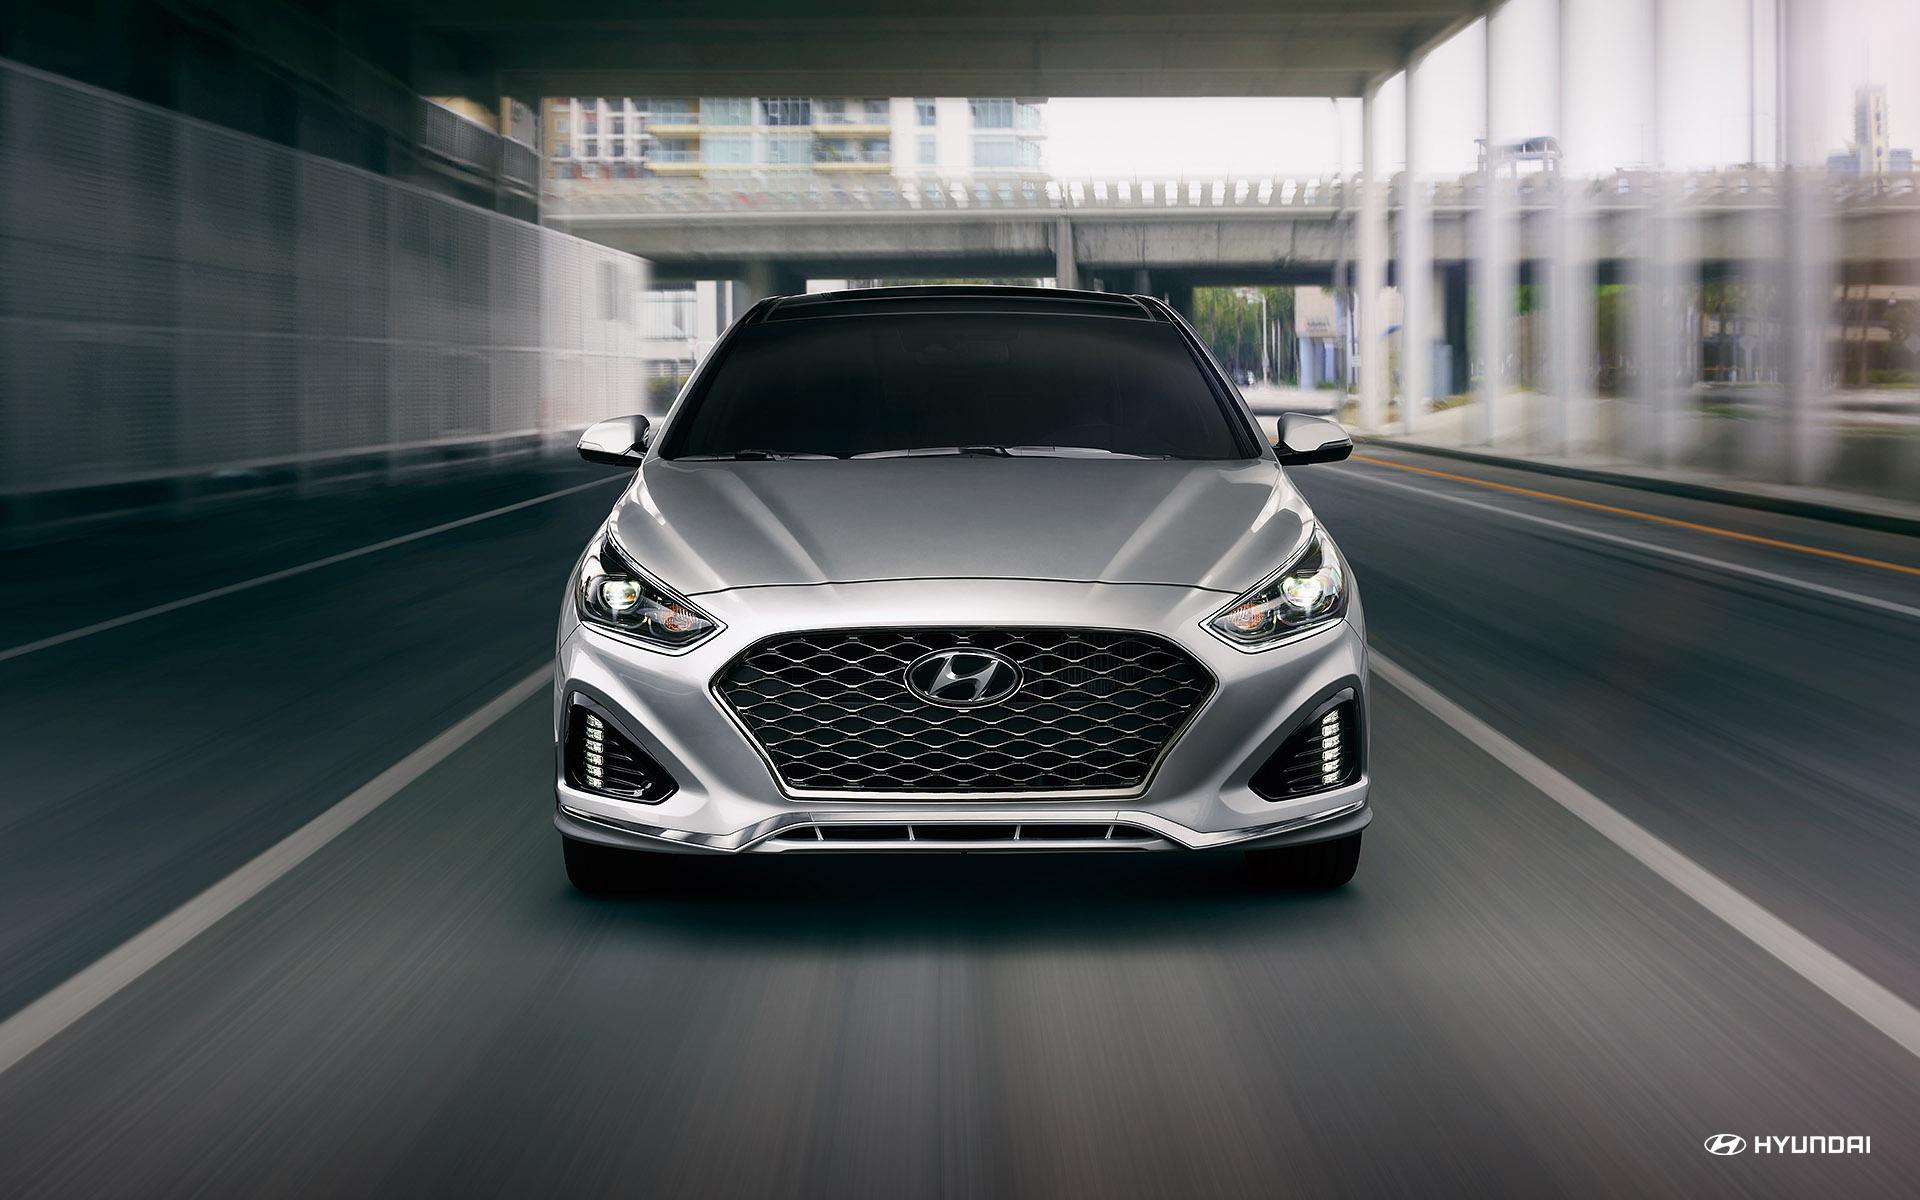 Buy, Lease, or Finance the 2019 Hyundai Sonata near Louisville CO